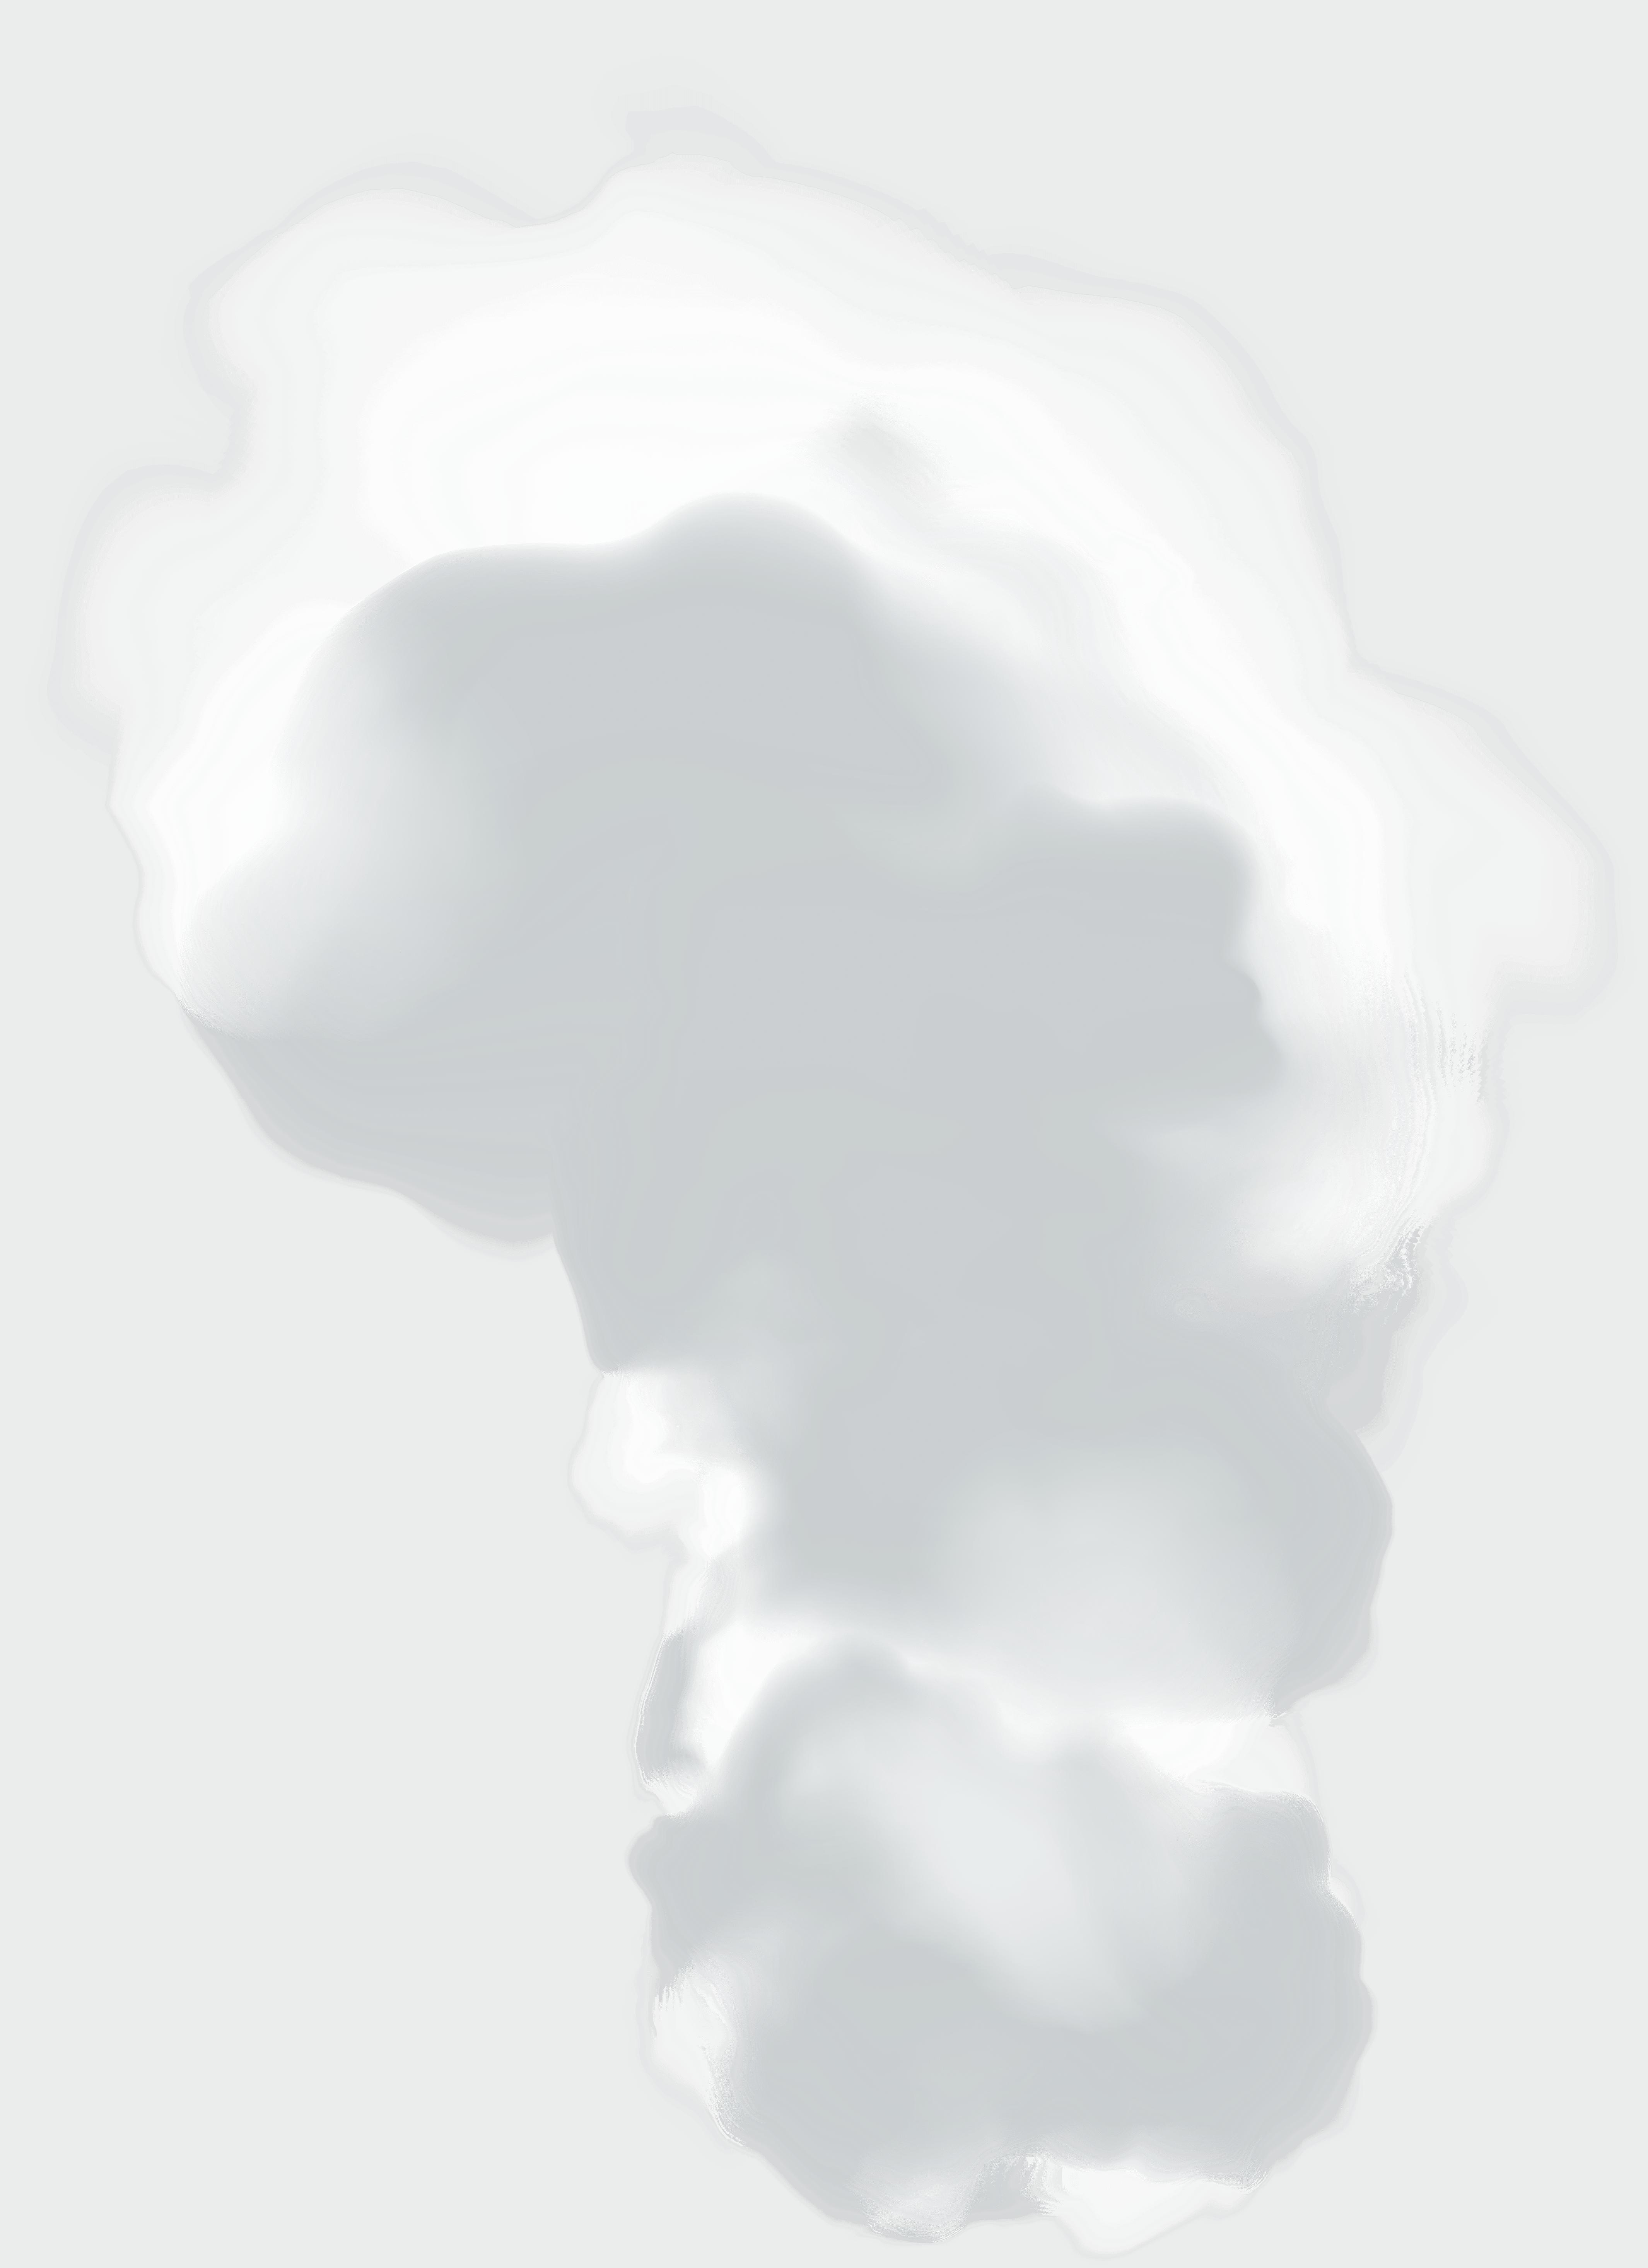 Smoke PNG Image.